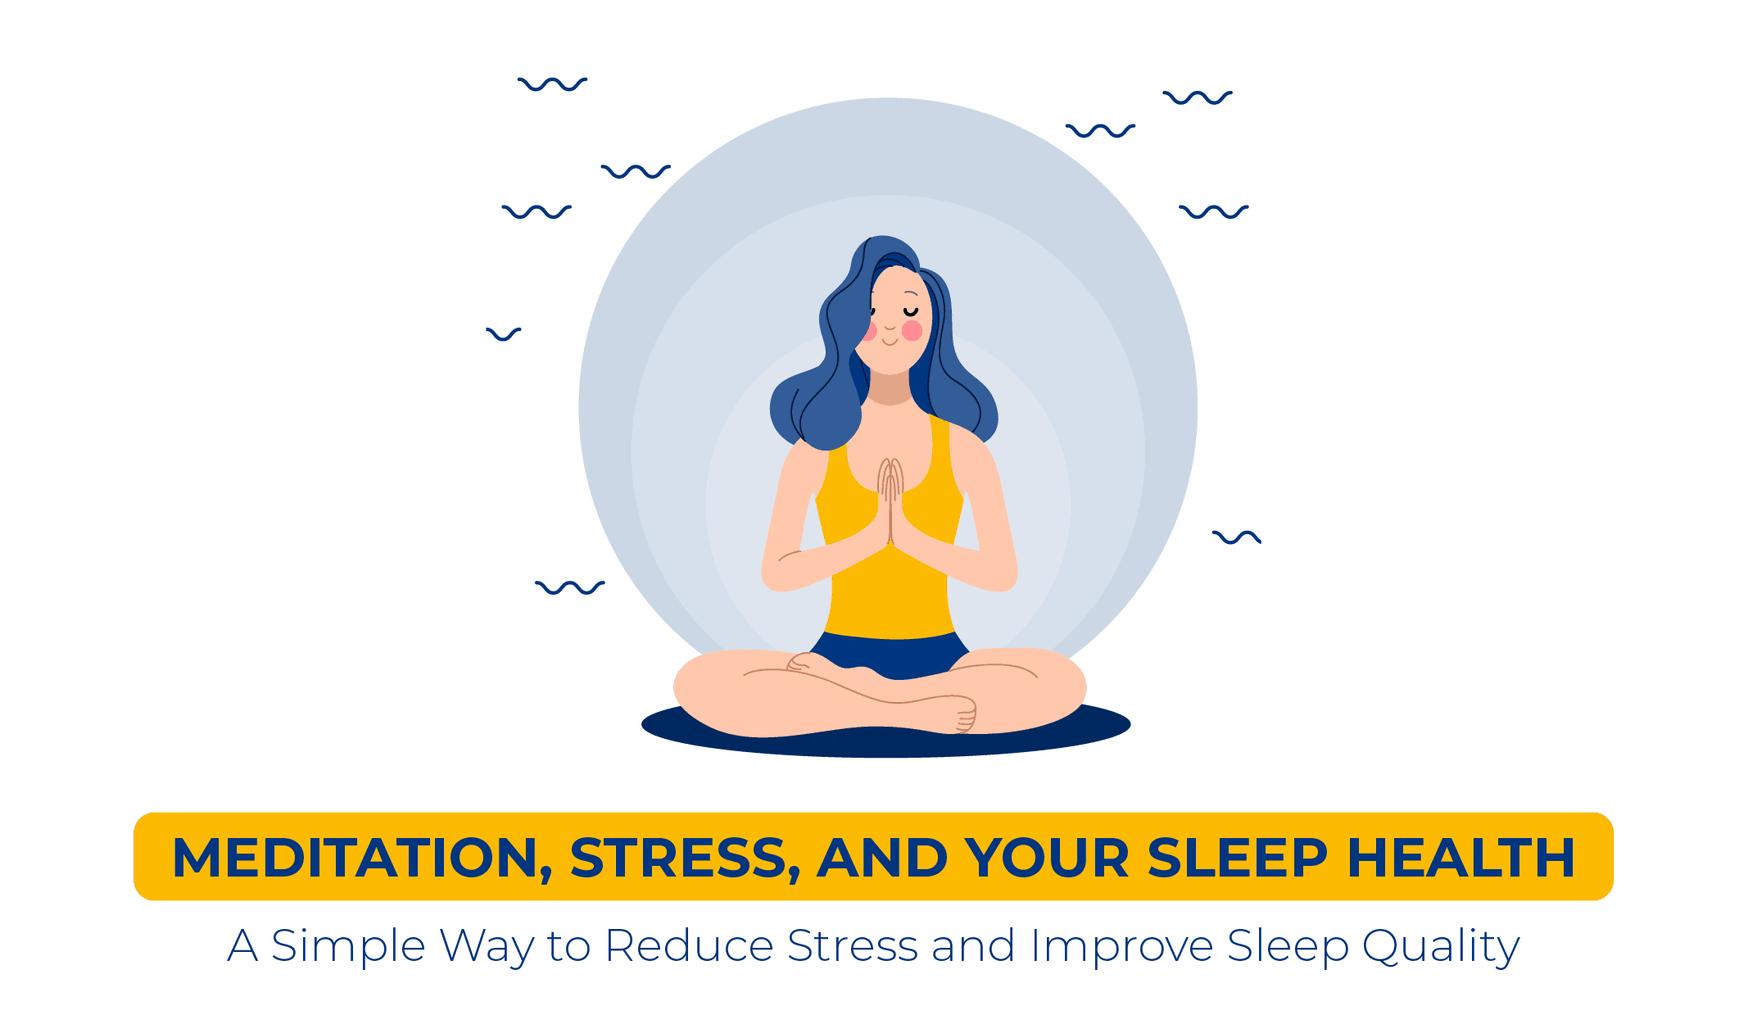 Meditation – A simplistic way to reduce stress and improve sleep